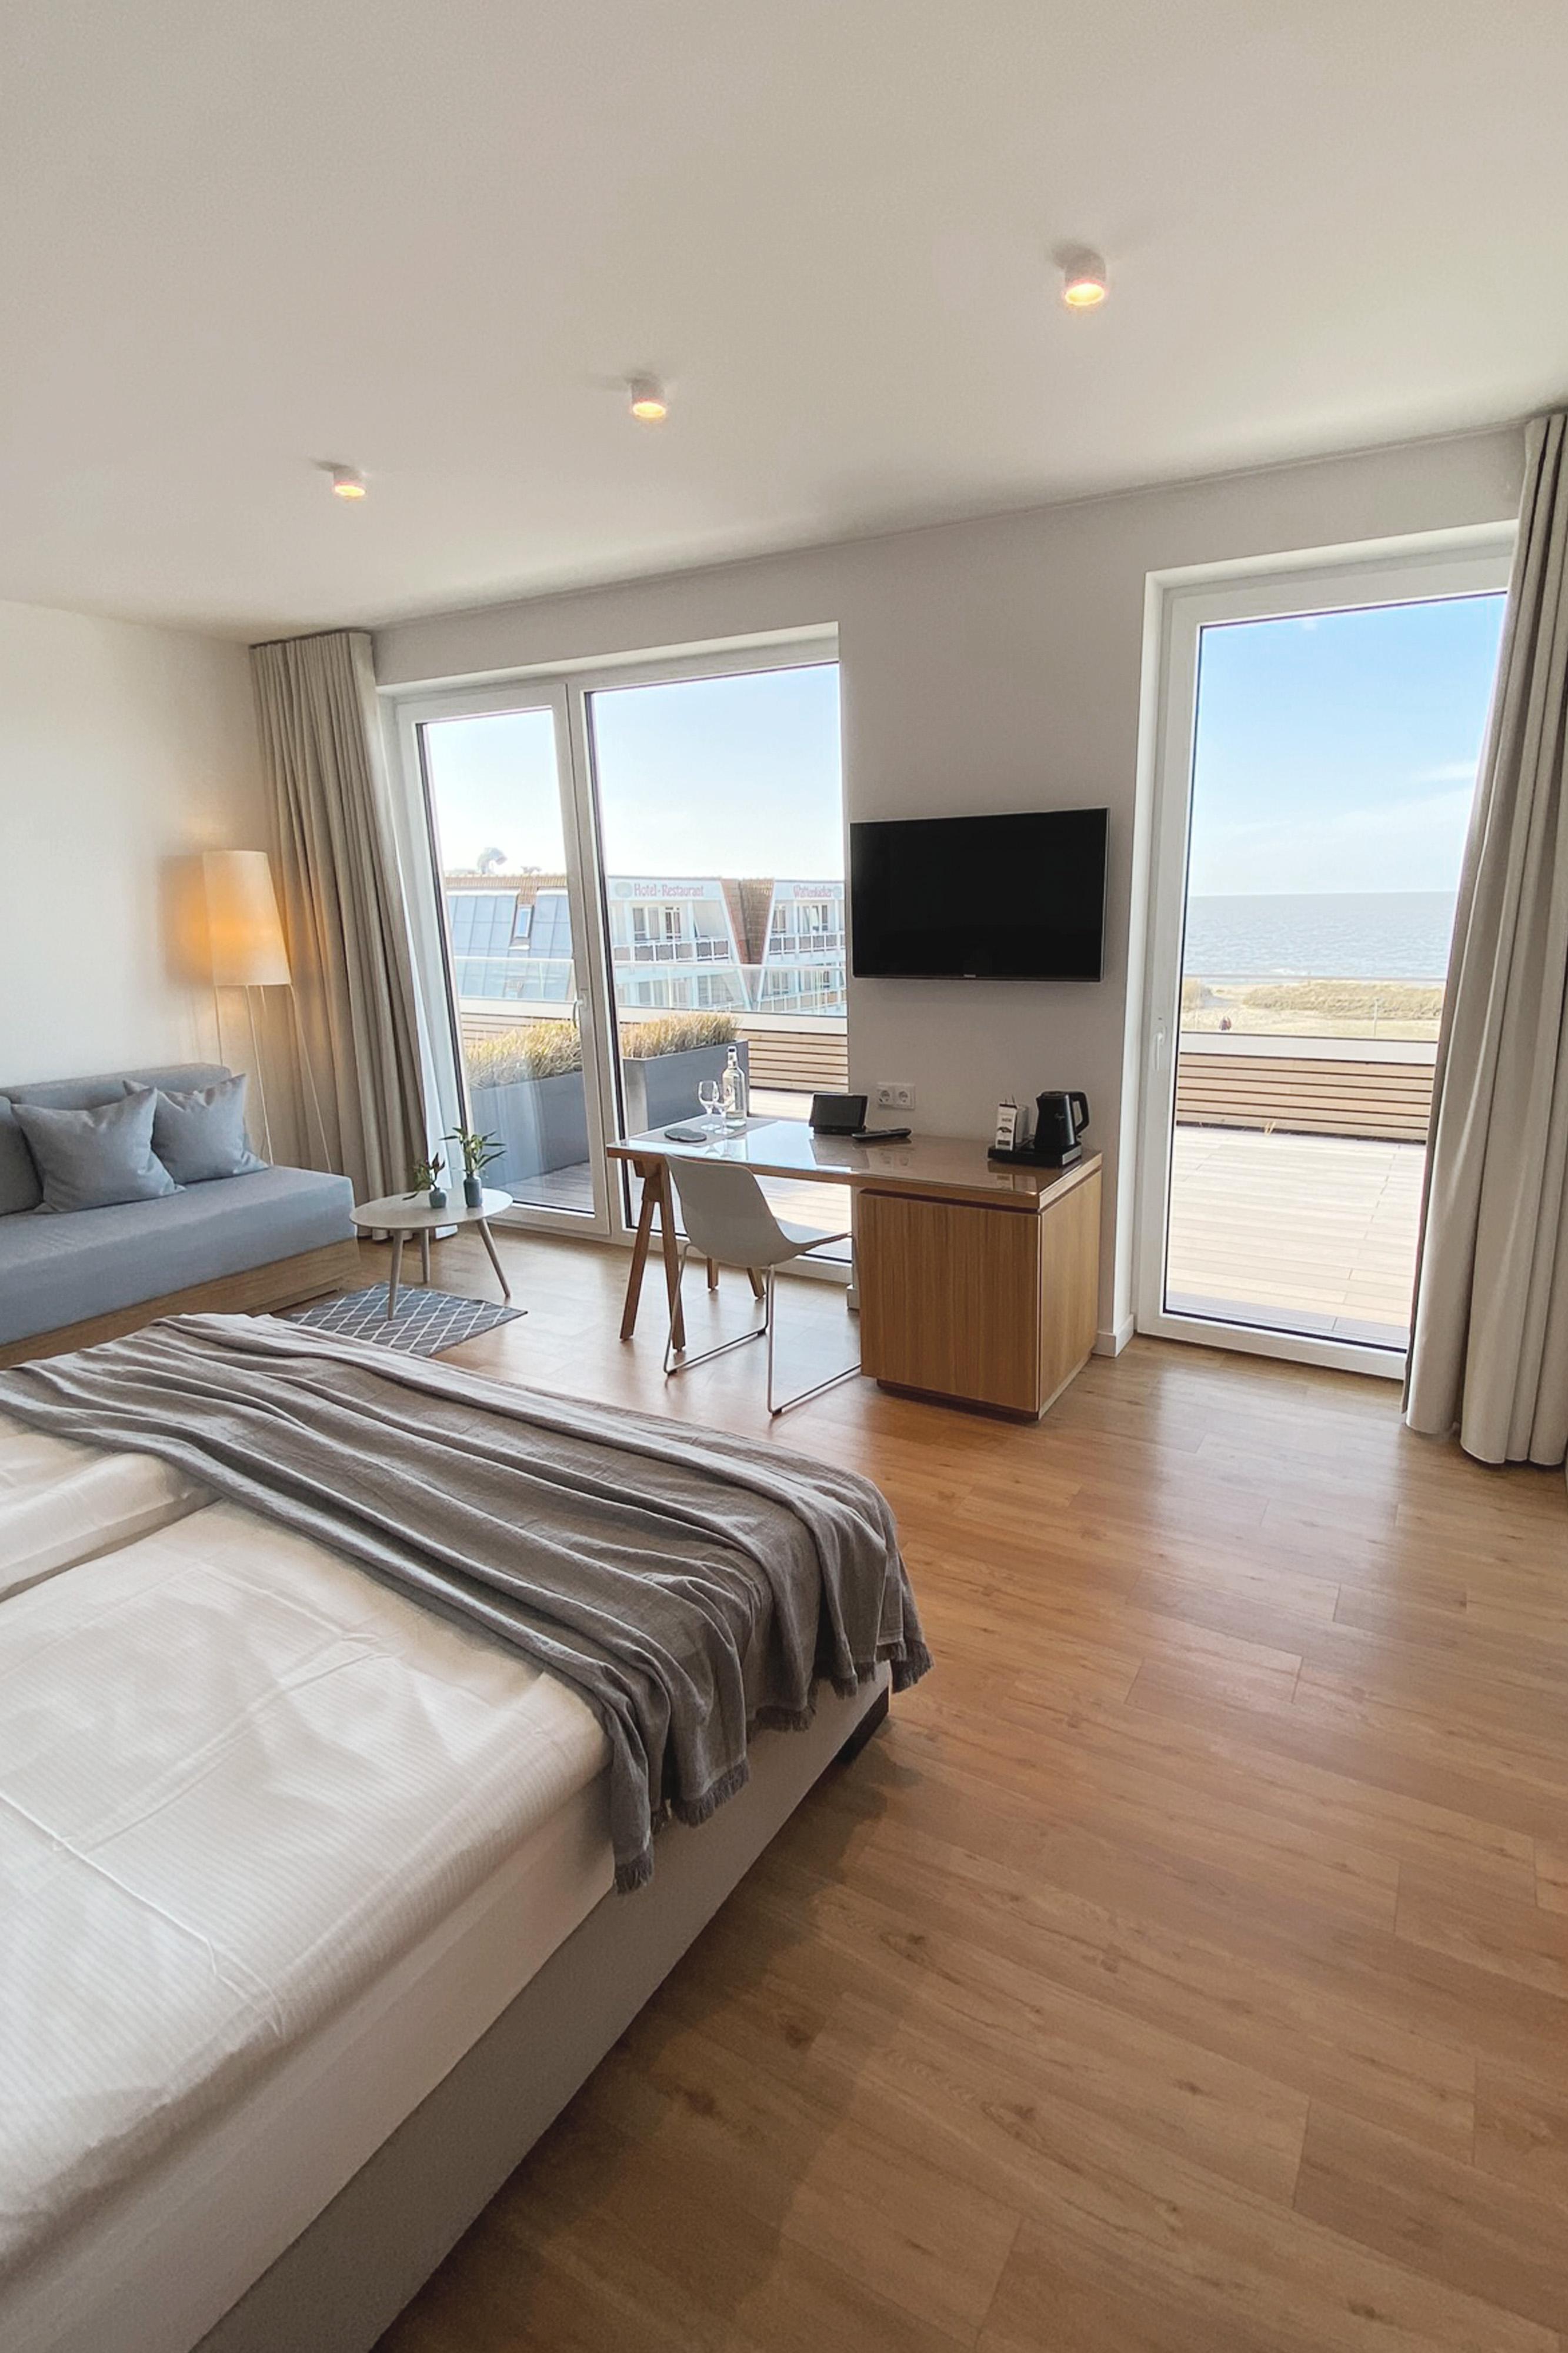 Hotel Strandhus Cuxhaven Zimmer Premium Seeblick